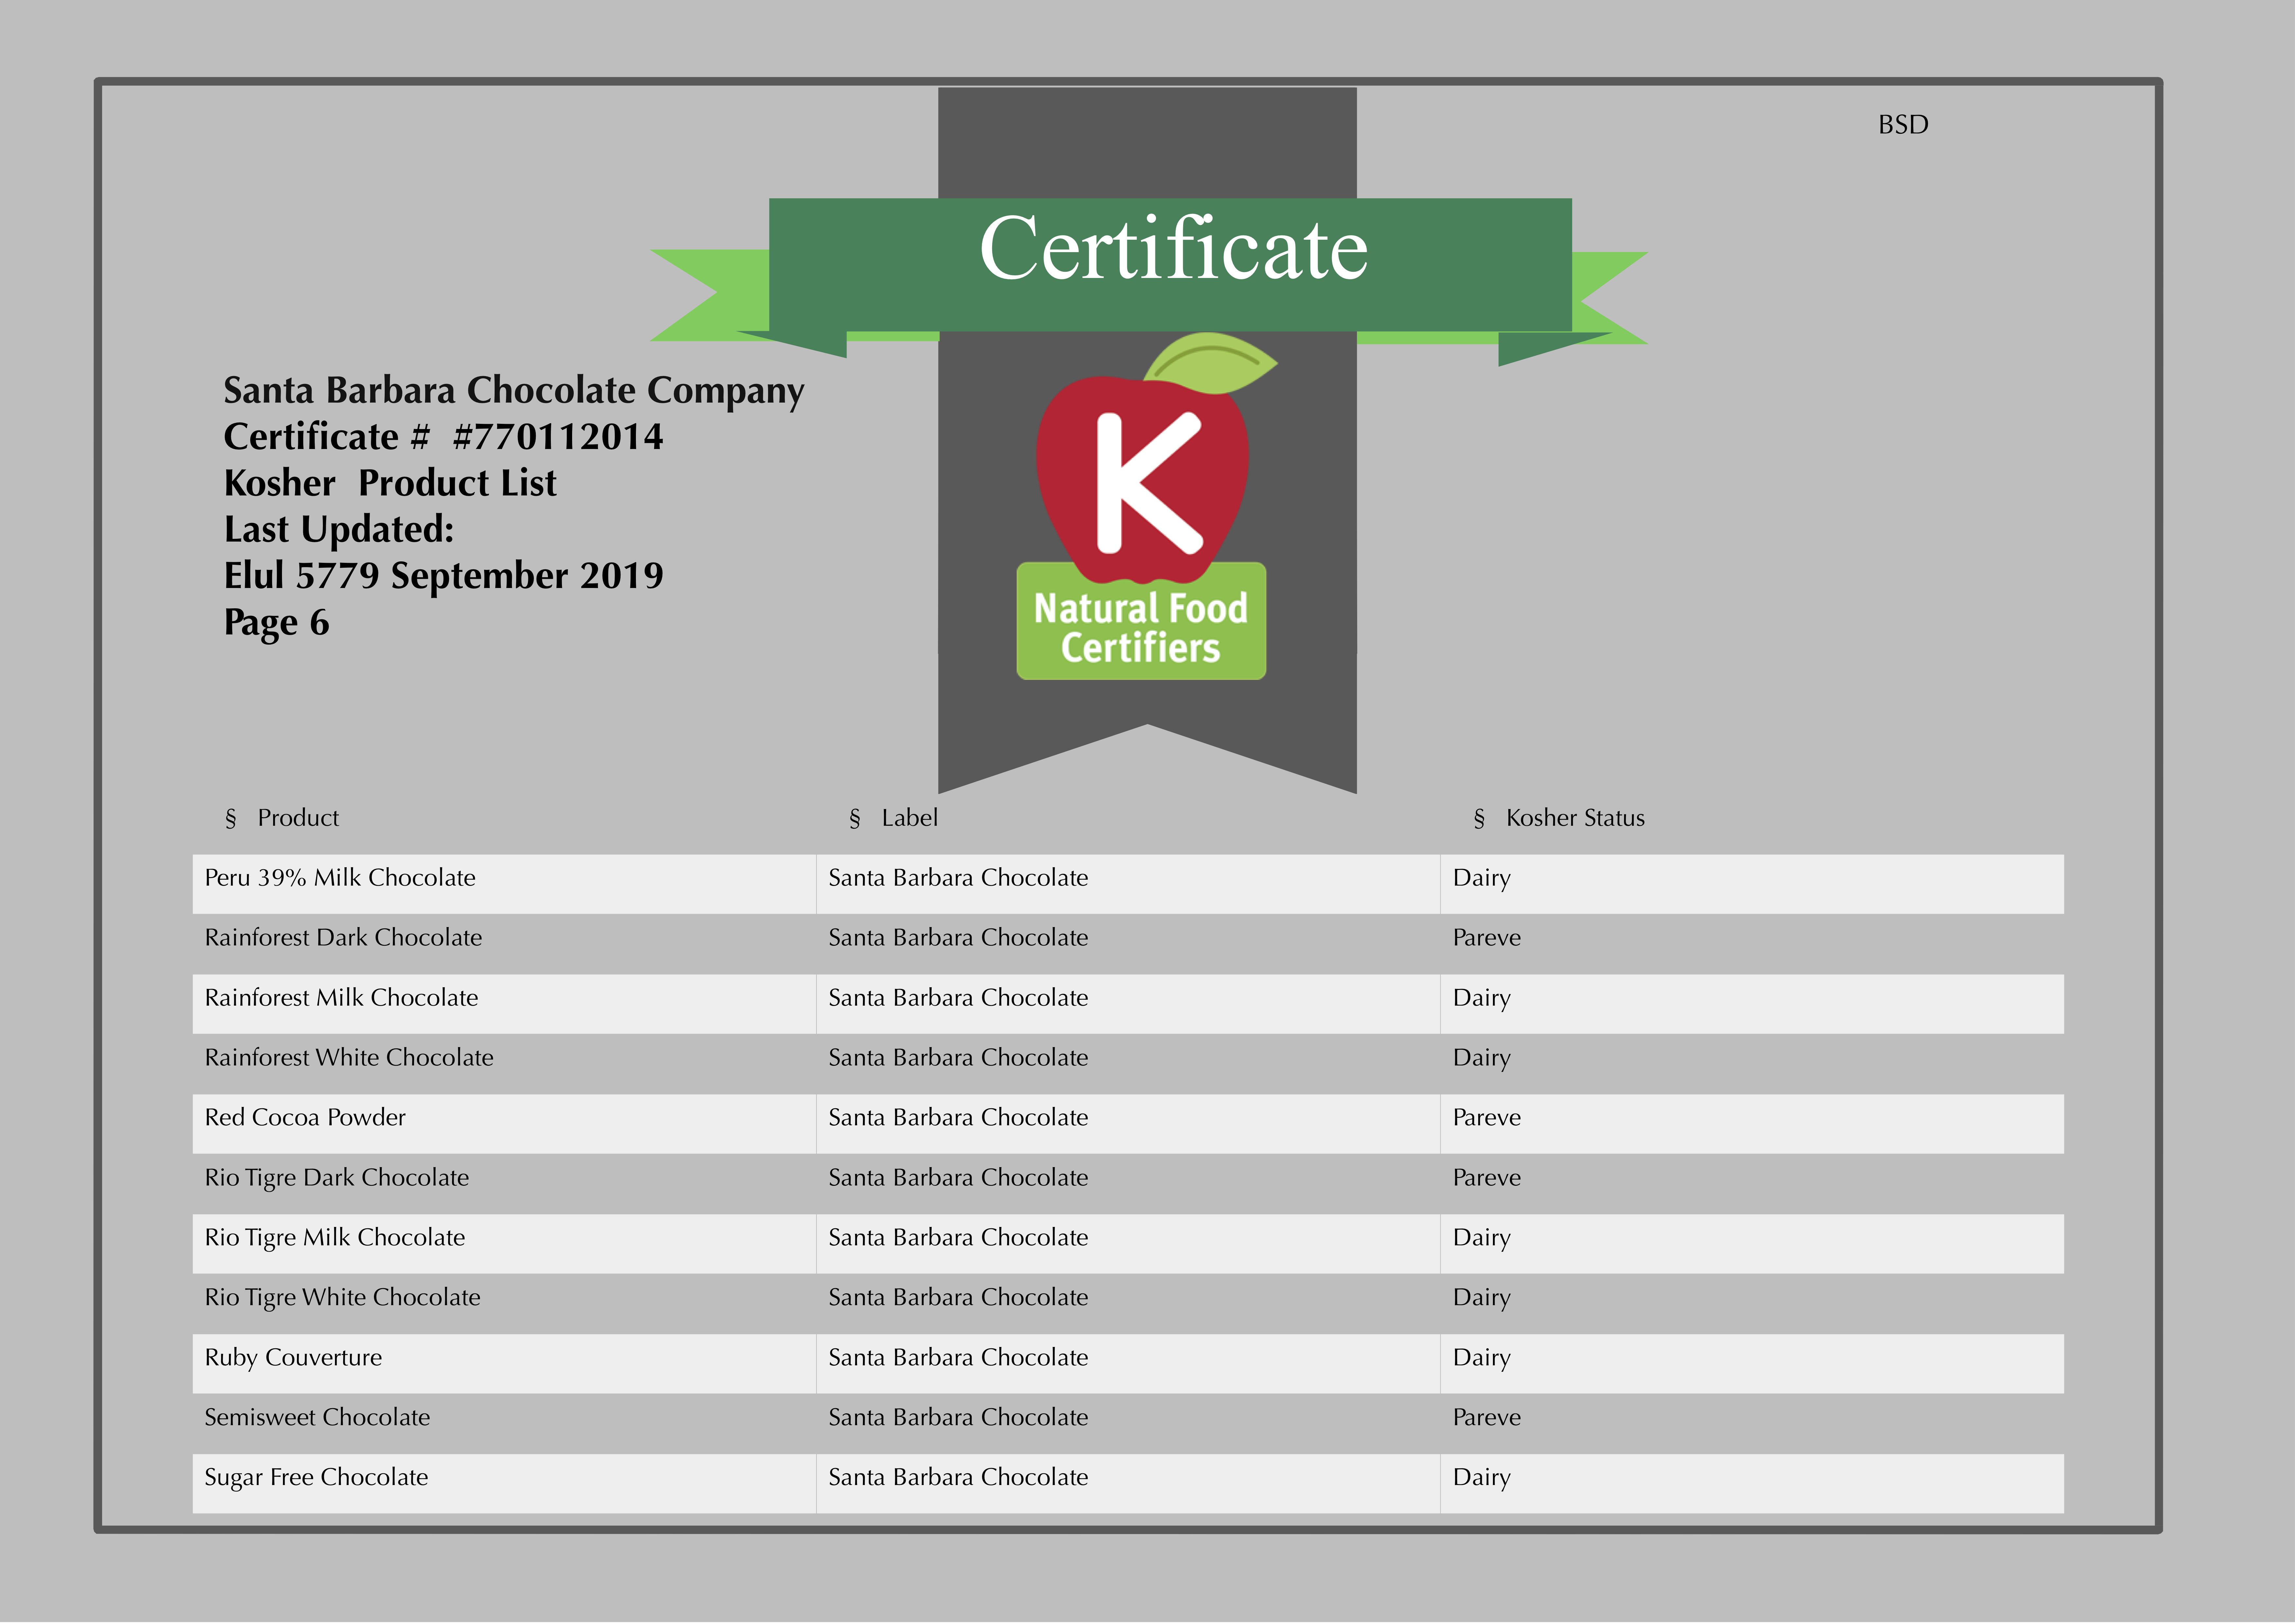 santa-barbara-chocolate-kosher-certificate-2019-2020-page-7.jpg